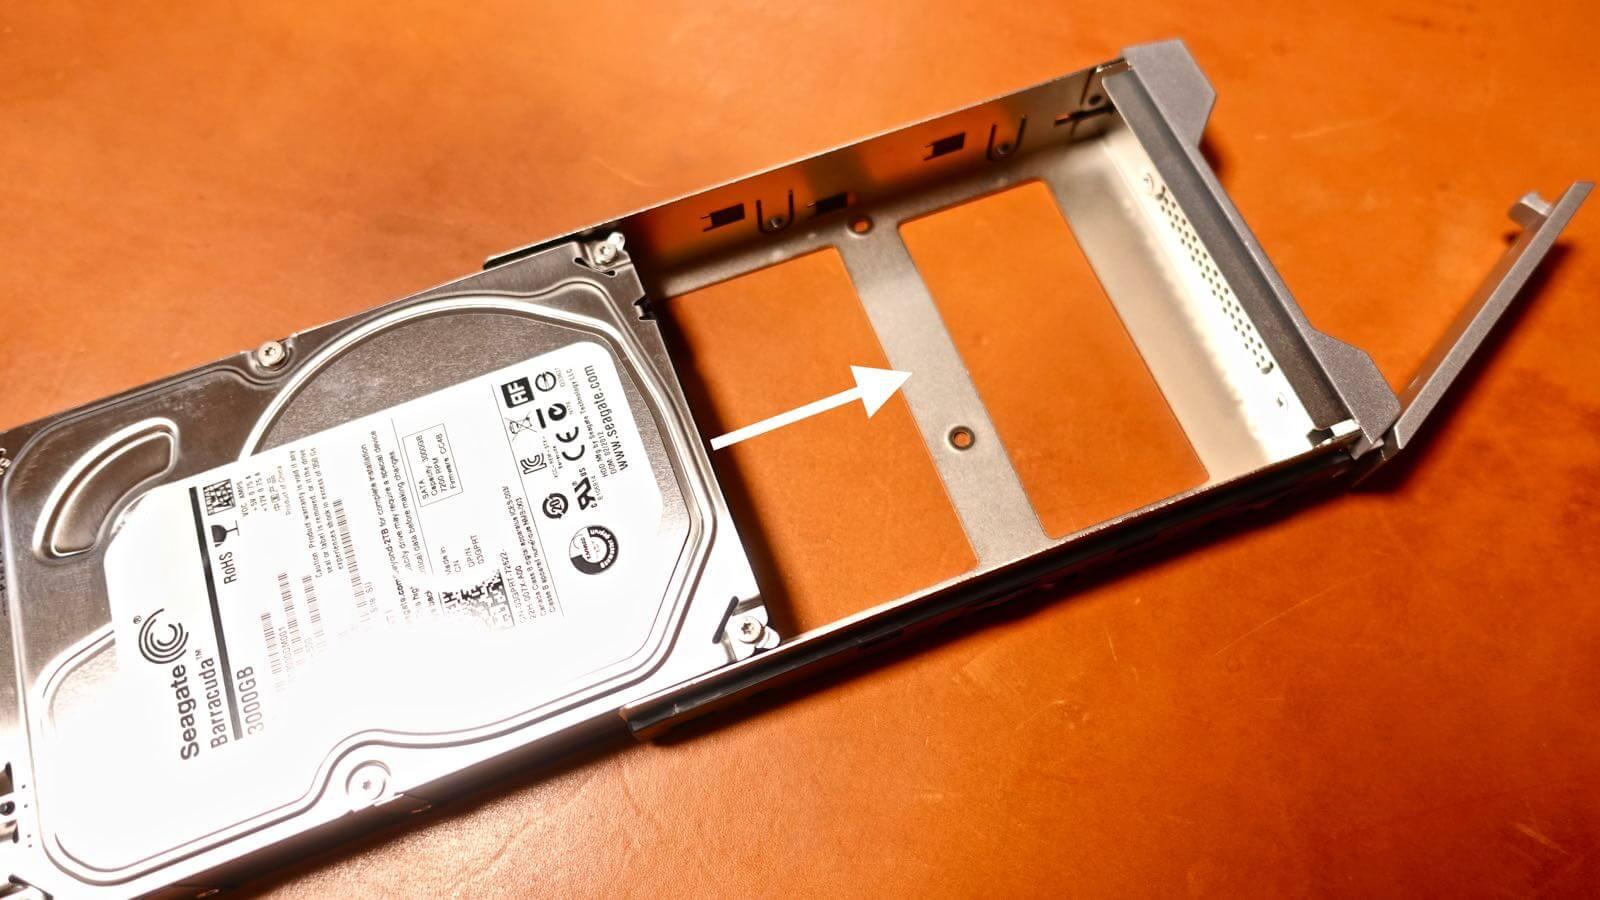 0085 STARDOM iTANK I310 HDD replacement method 09